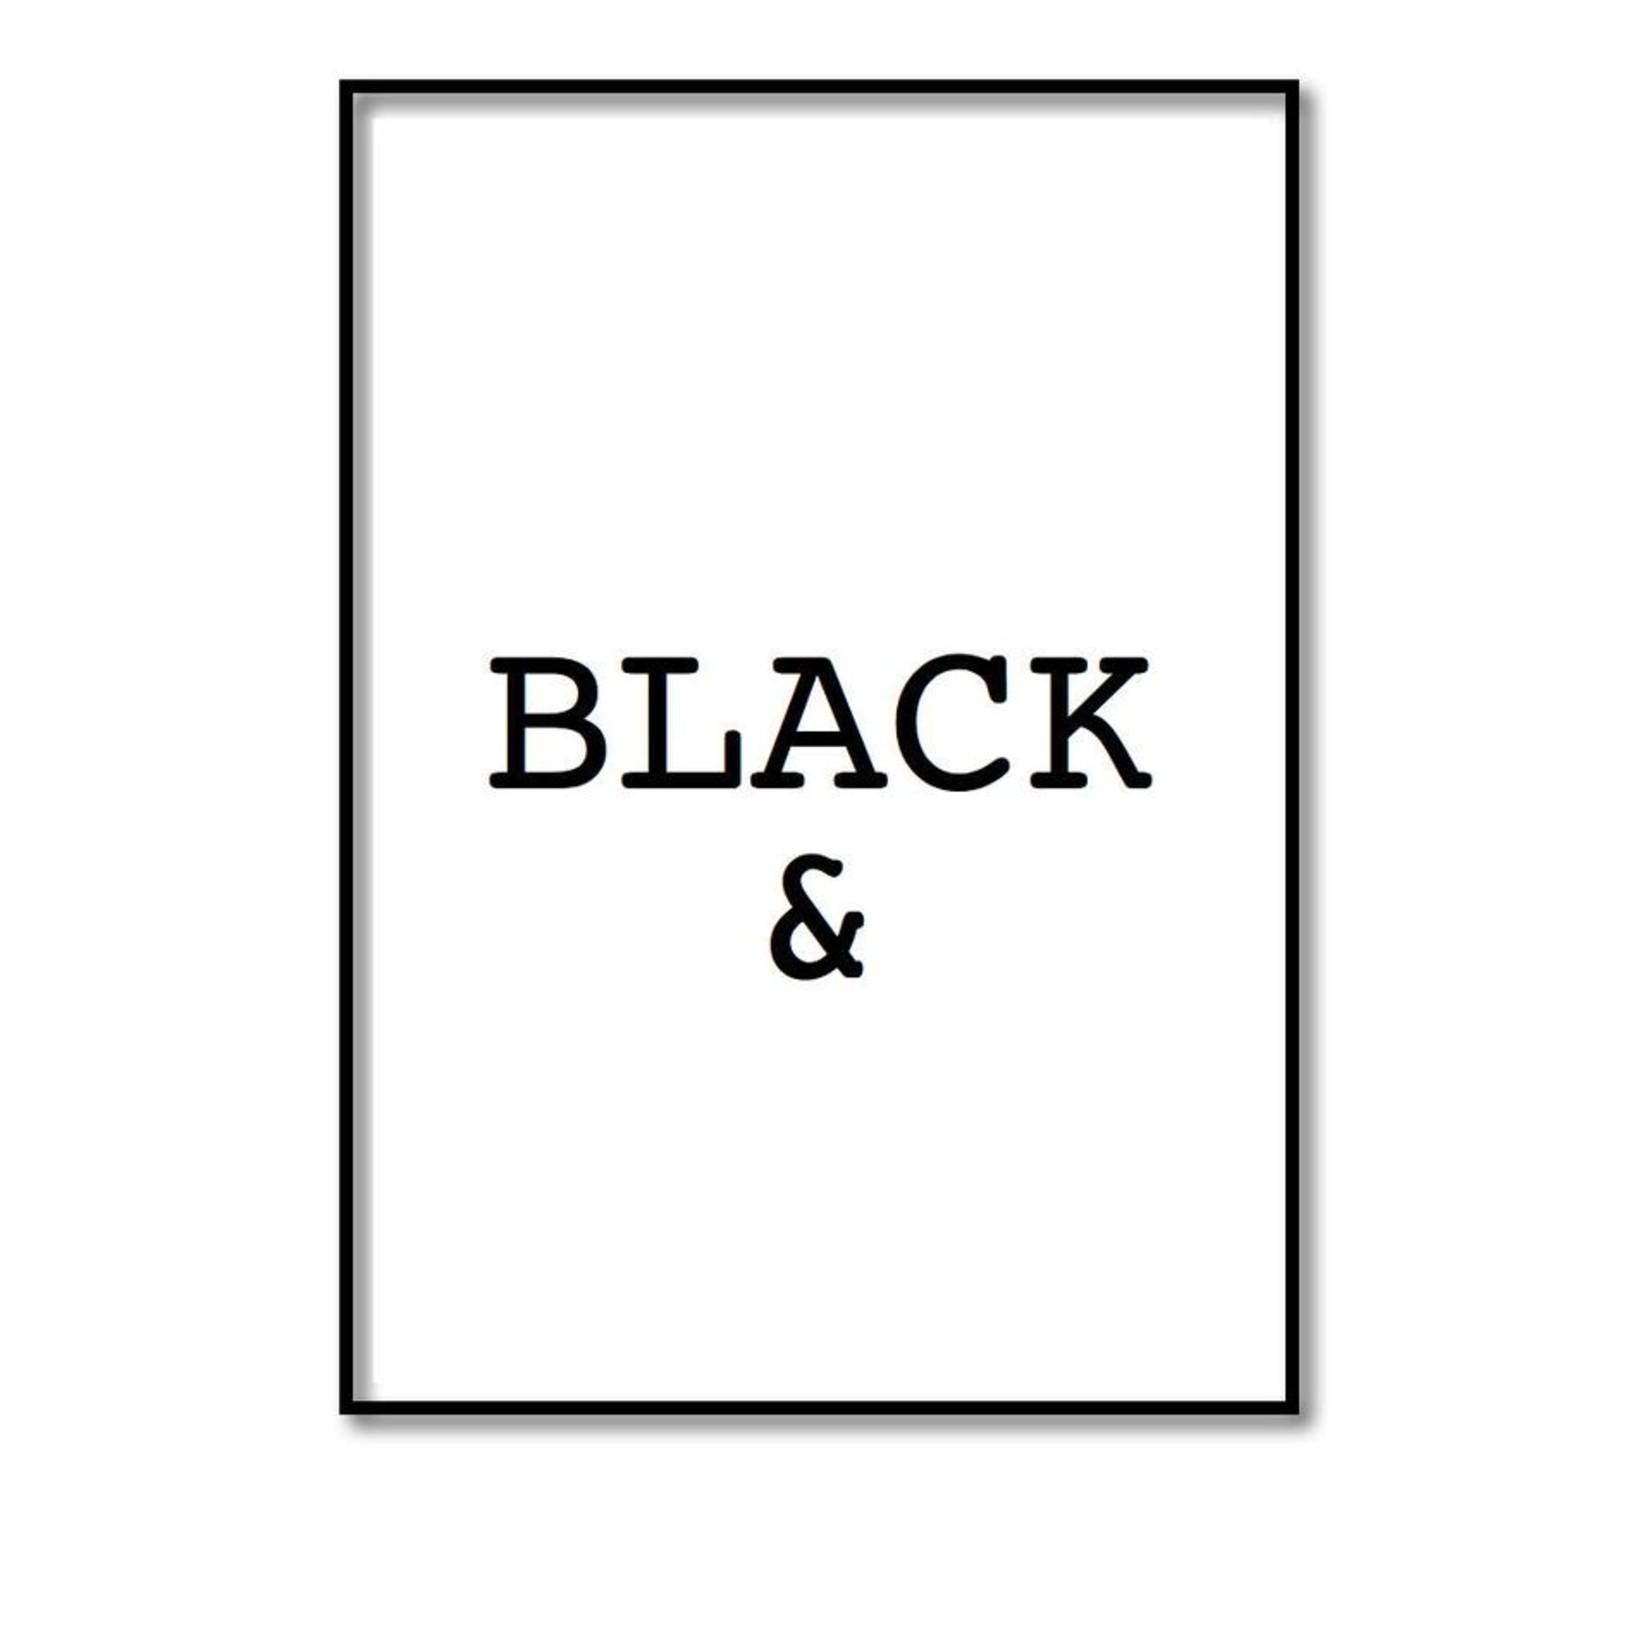 Pixelposter - Black & (A5)